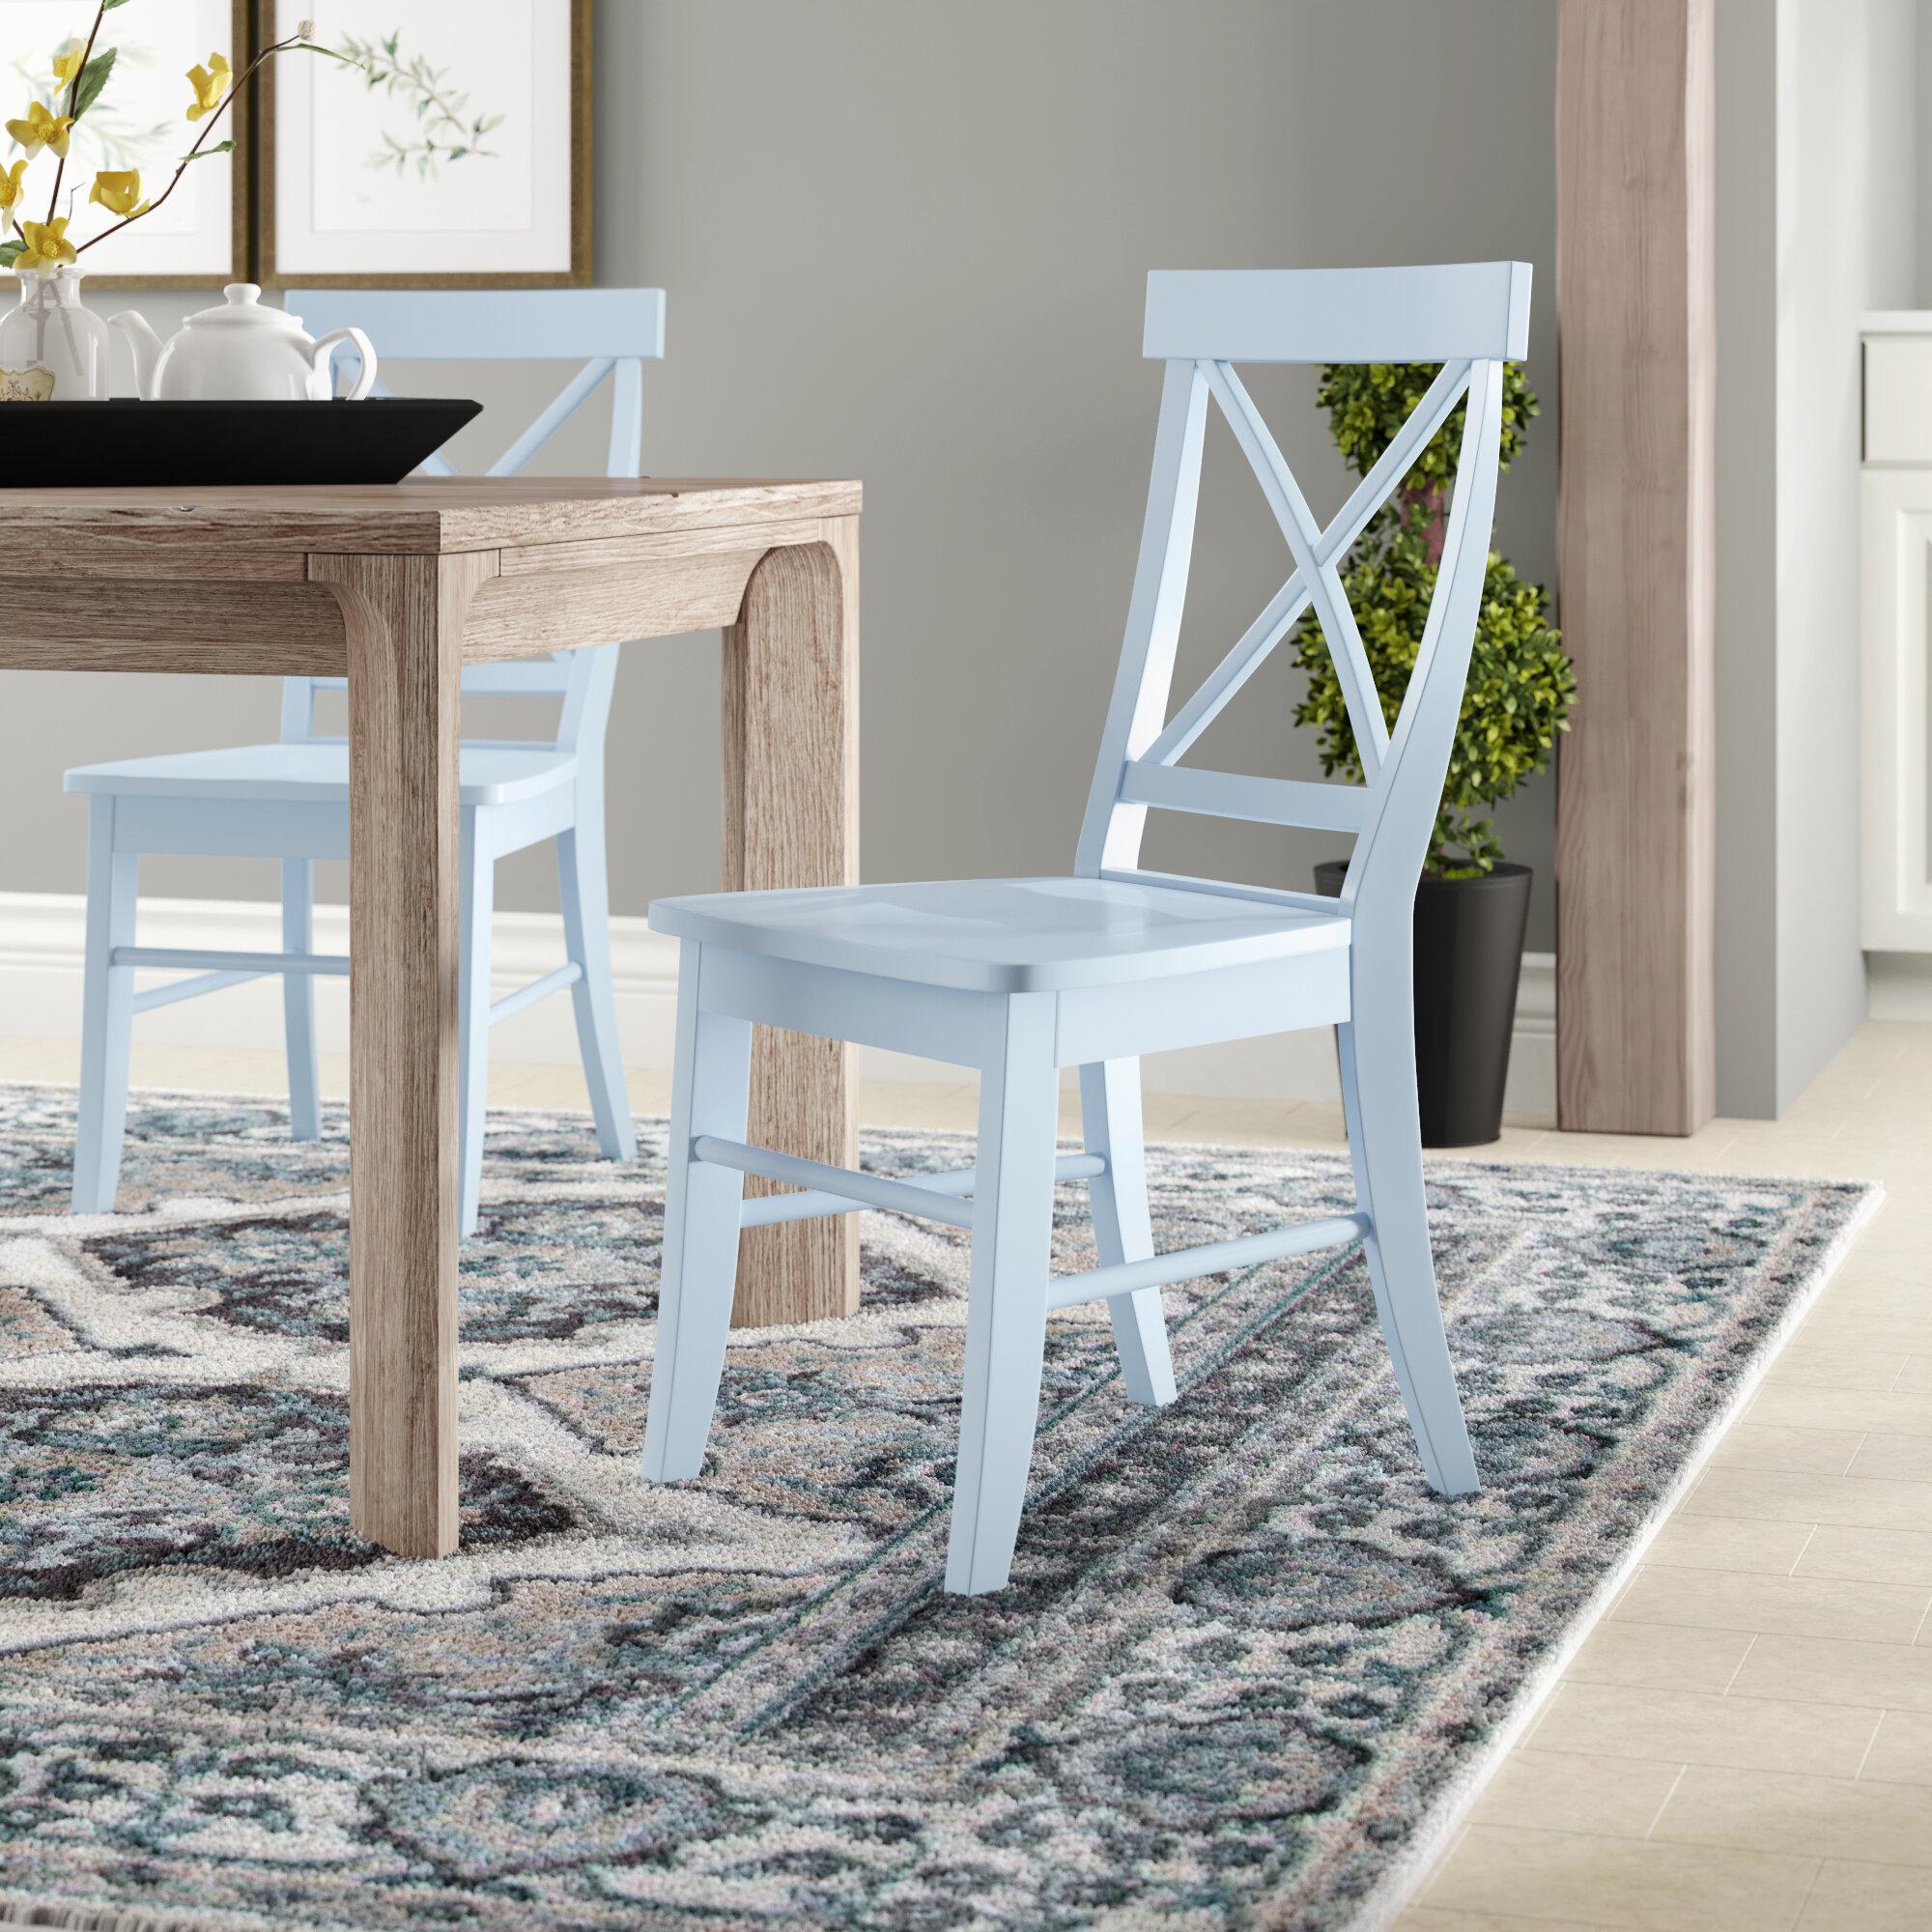 Natural Woven Chairs | Wayfair